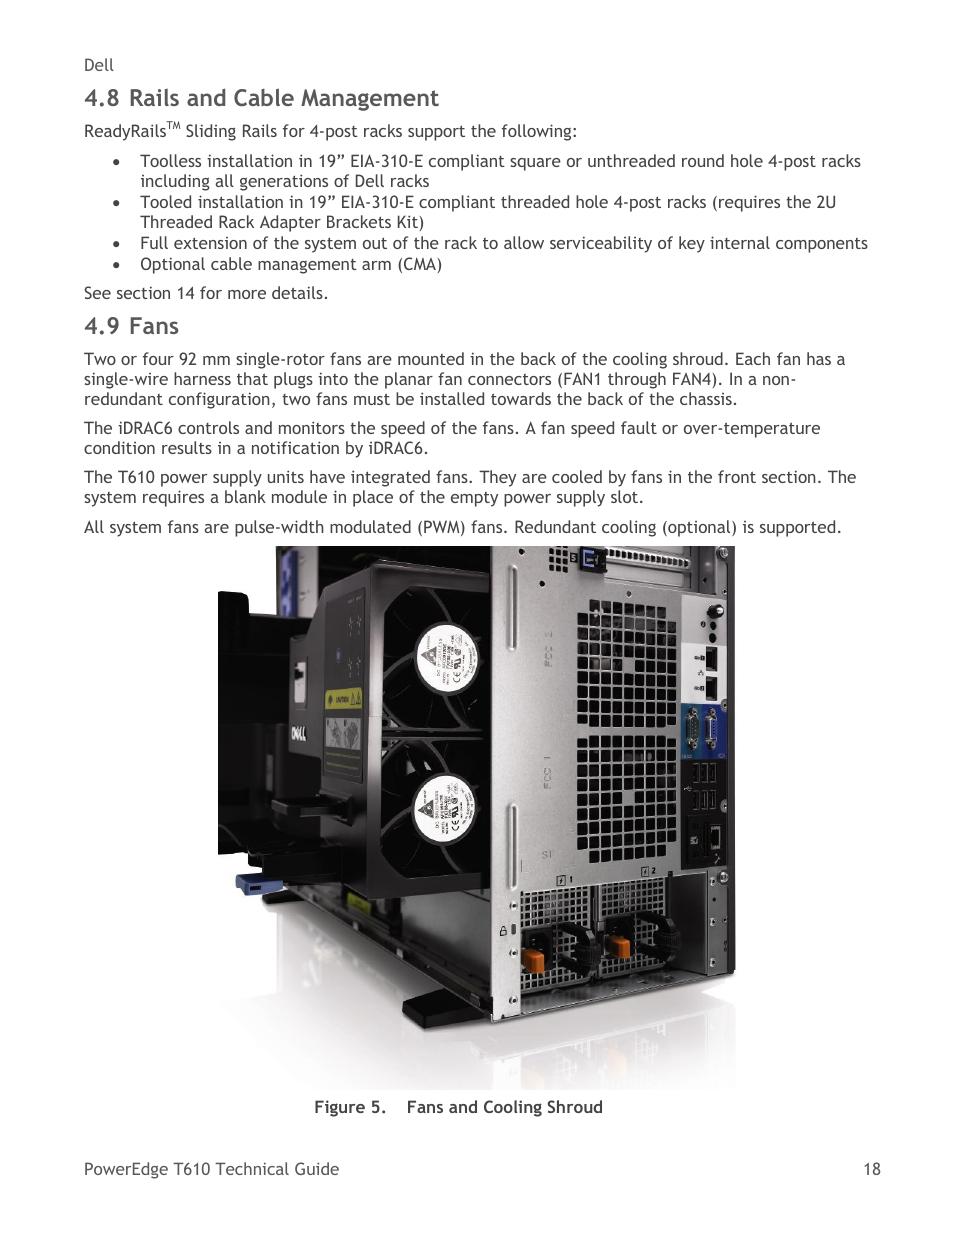 Rails and cable management, Fans, Figure 5   Dell PowerEdge